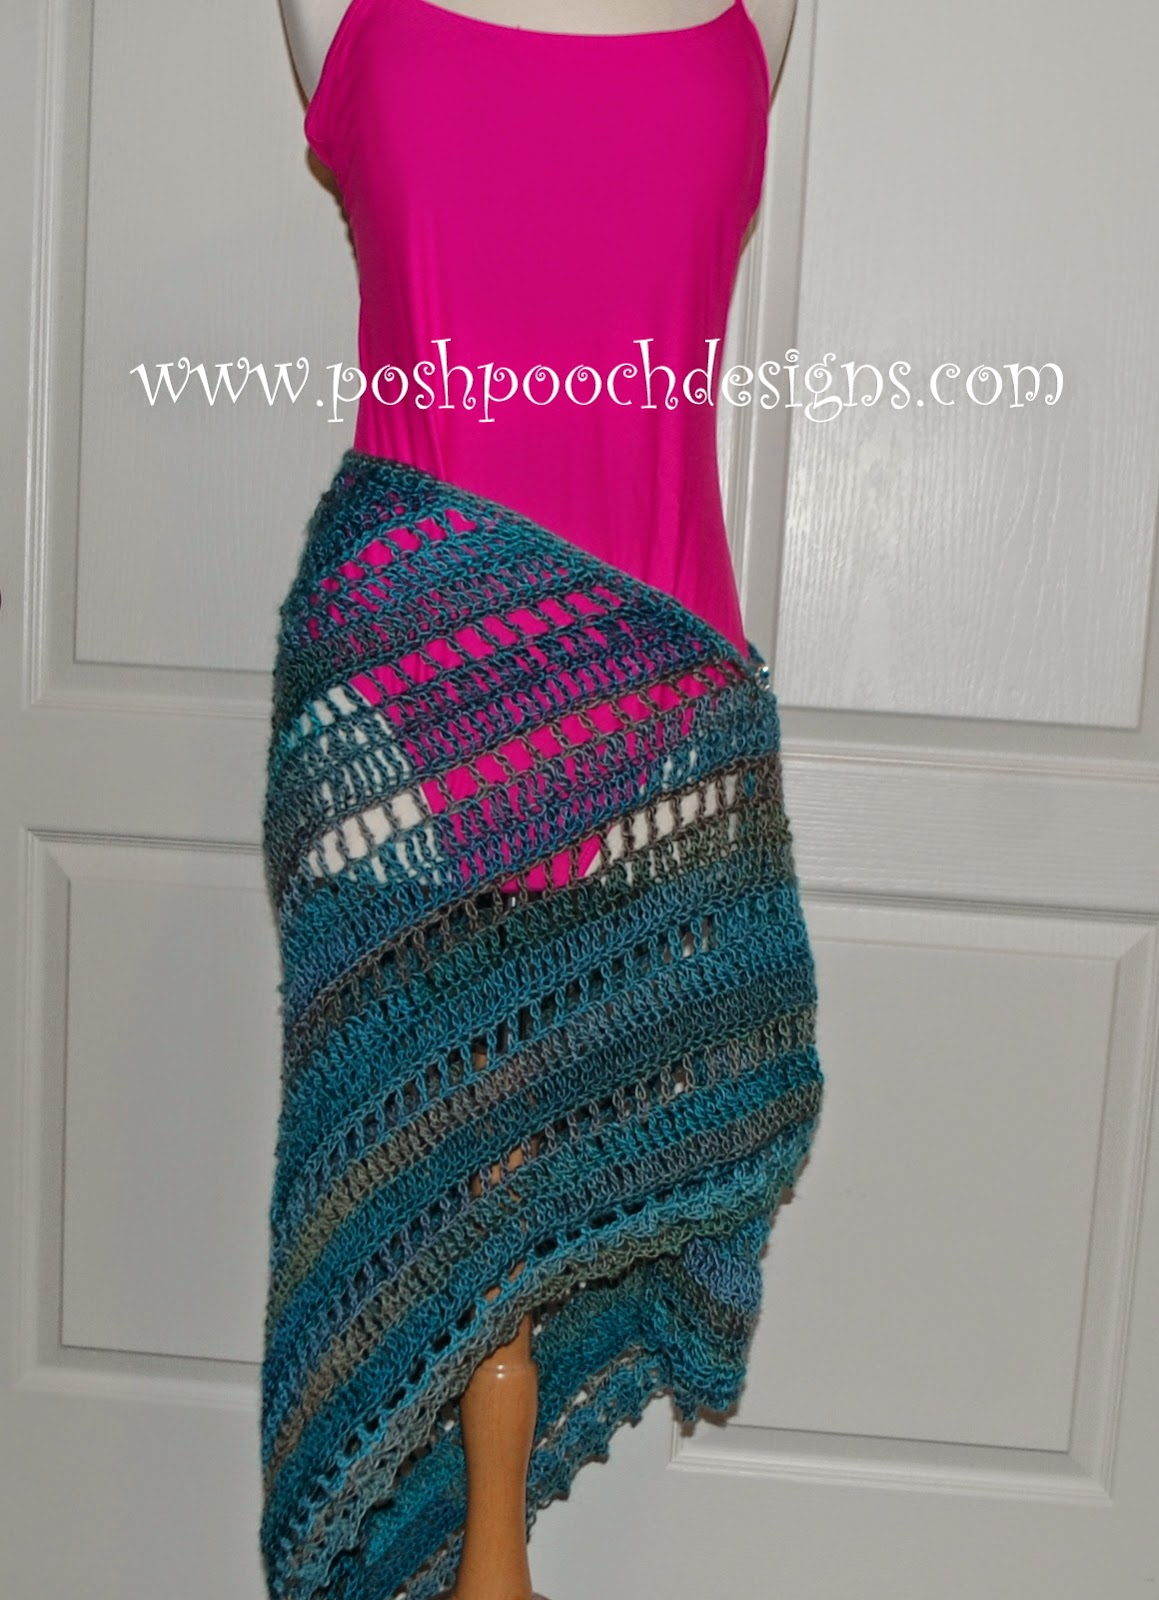 Free Crochet Pattern For Beach Wrap : Posh Pooch Designs Dog Clothes: Beach Vacation Shawl Free ...